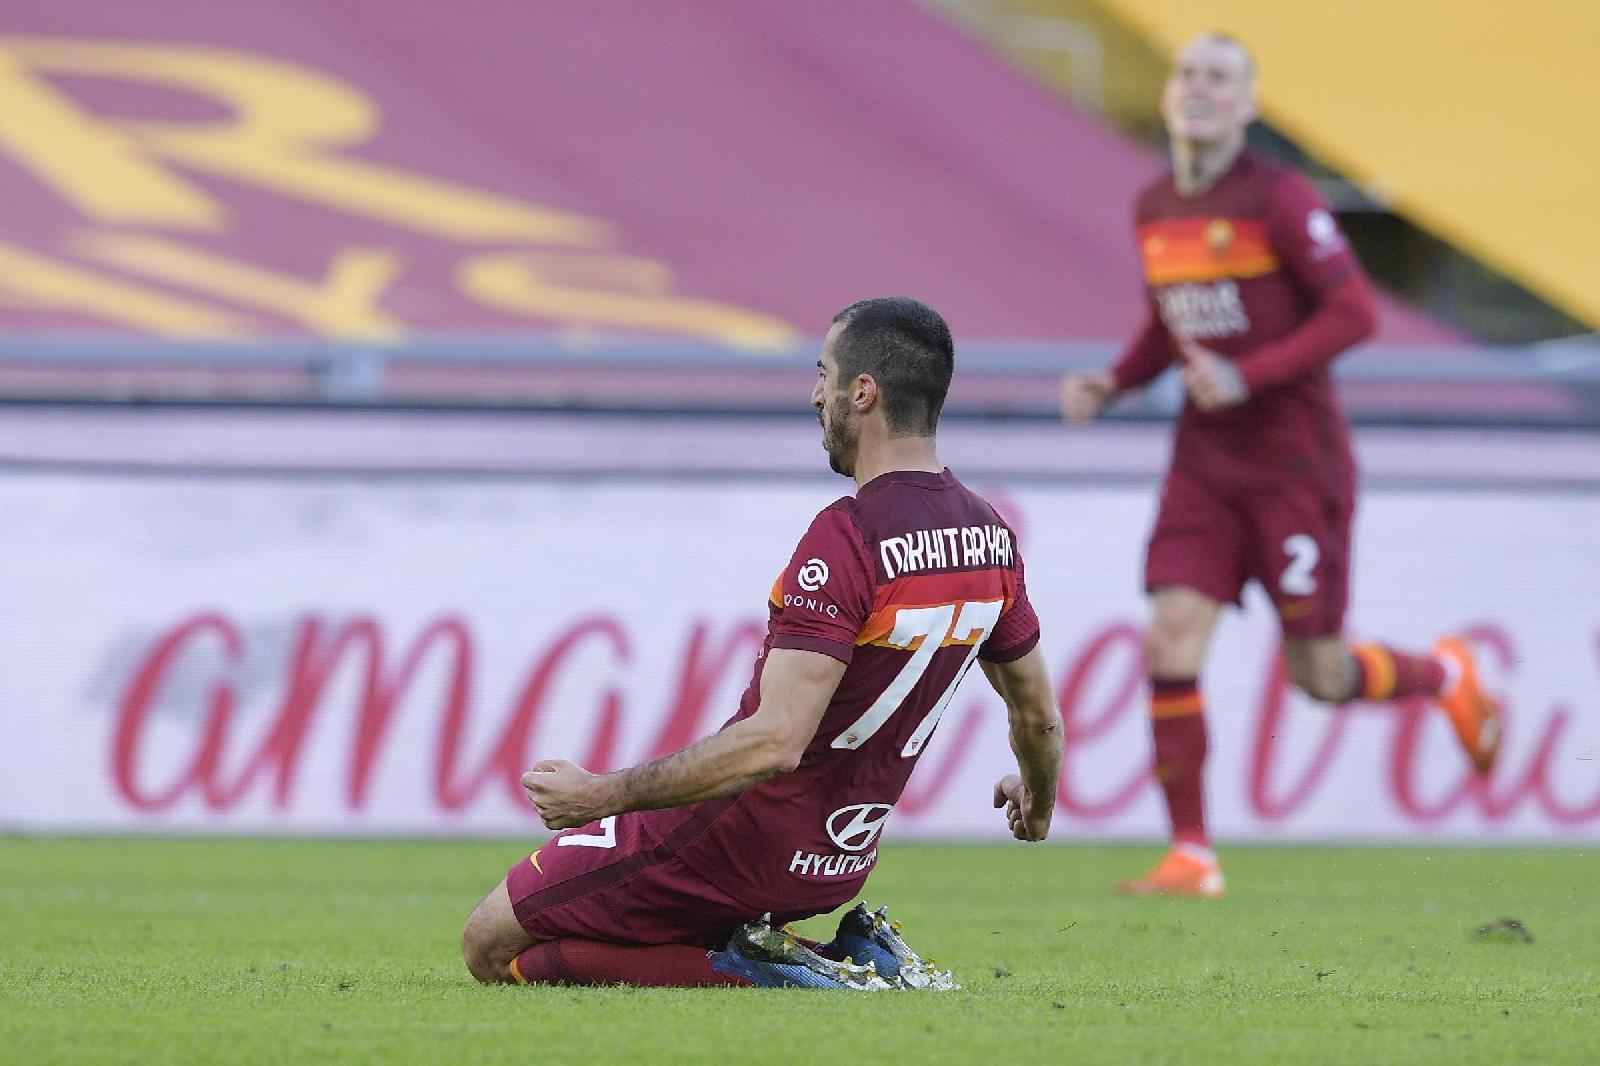 Le pagelle di Roma-Parma: Mkhitaryan stellare, Mayoral ...